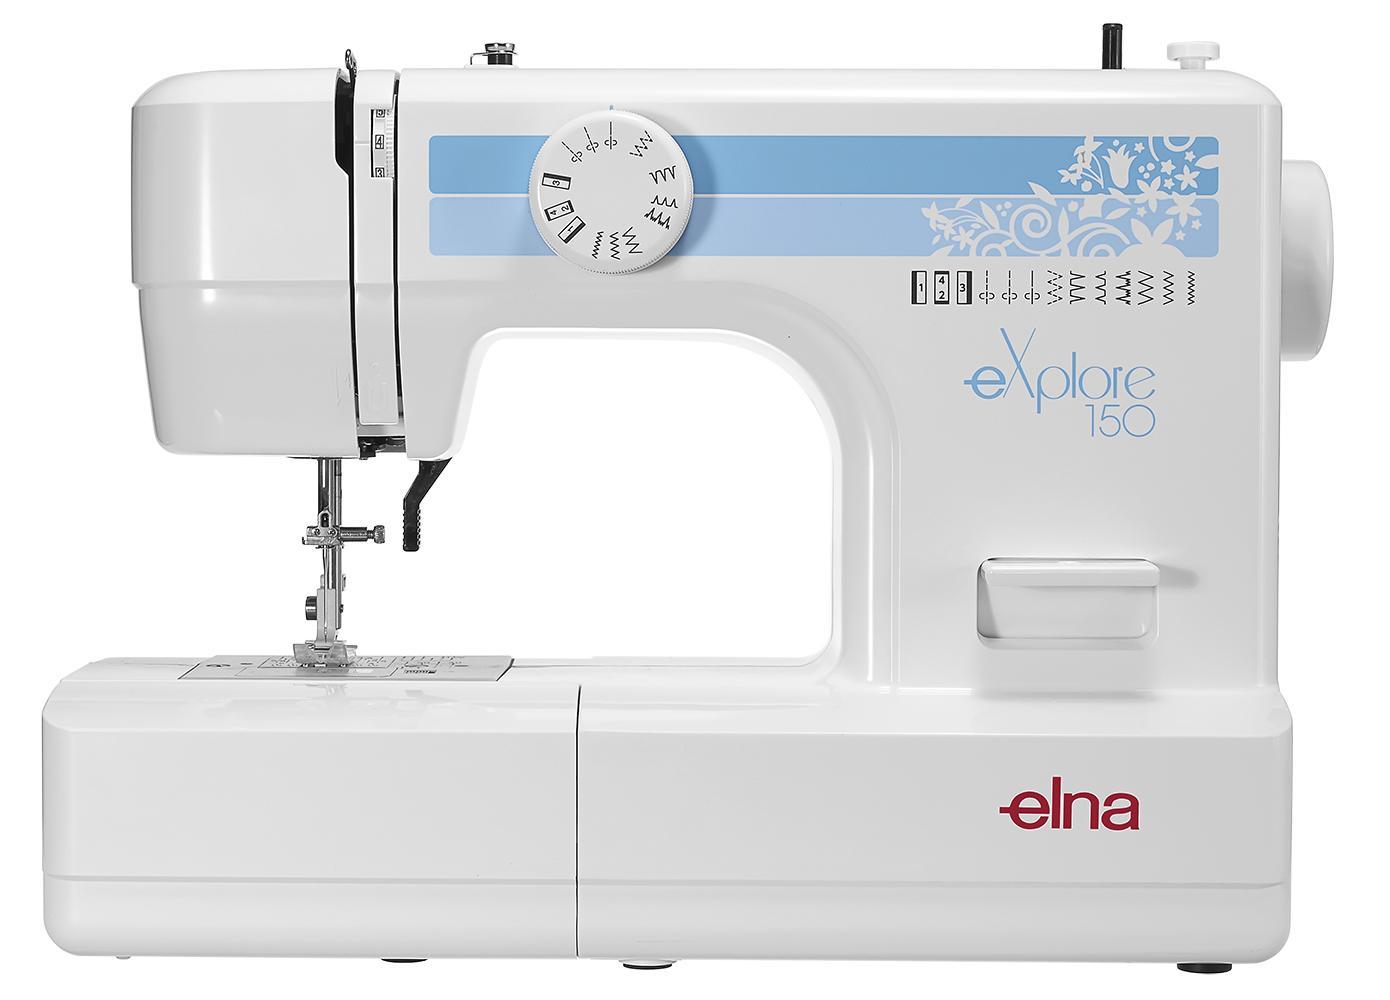 šicí stroj Elna eXplore 150-1